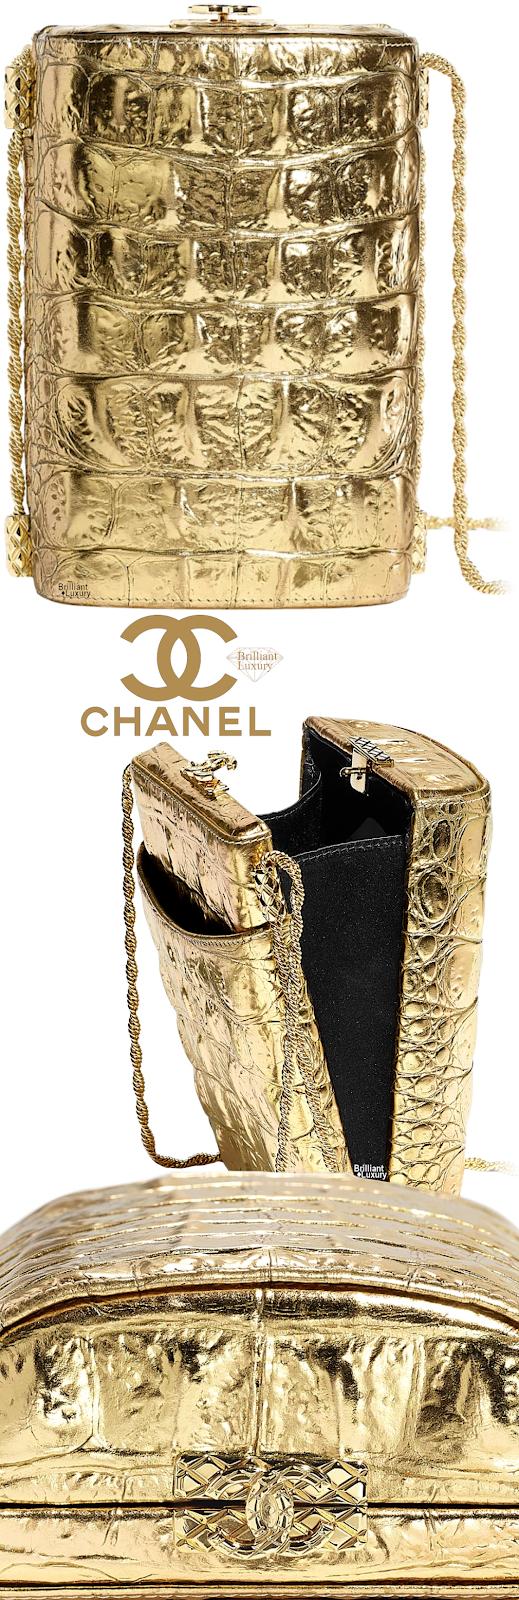 Brilliant Luxury♦Chanel Metallic Crocodile Embossed Calfskin Evening Bag #gold